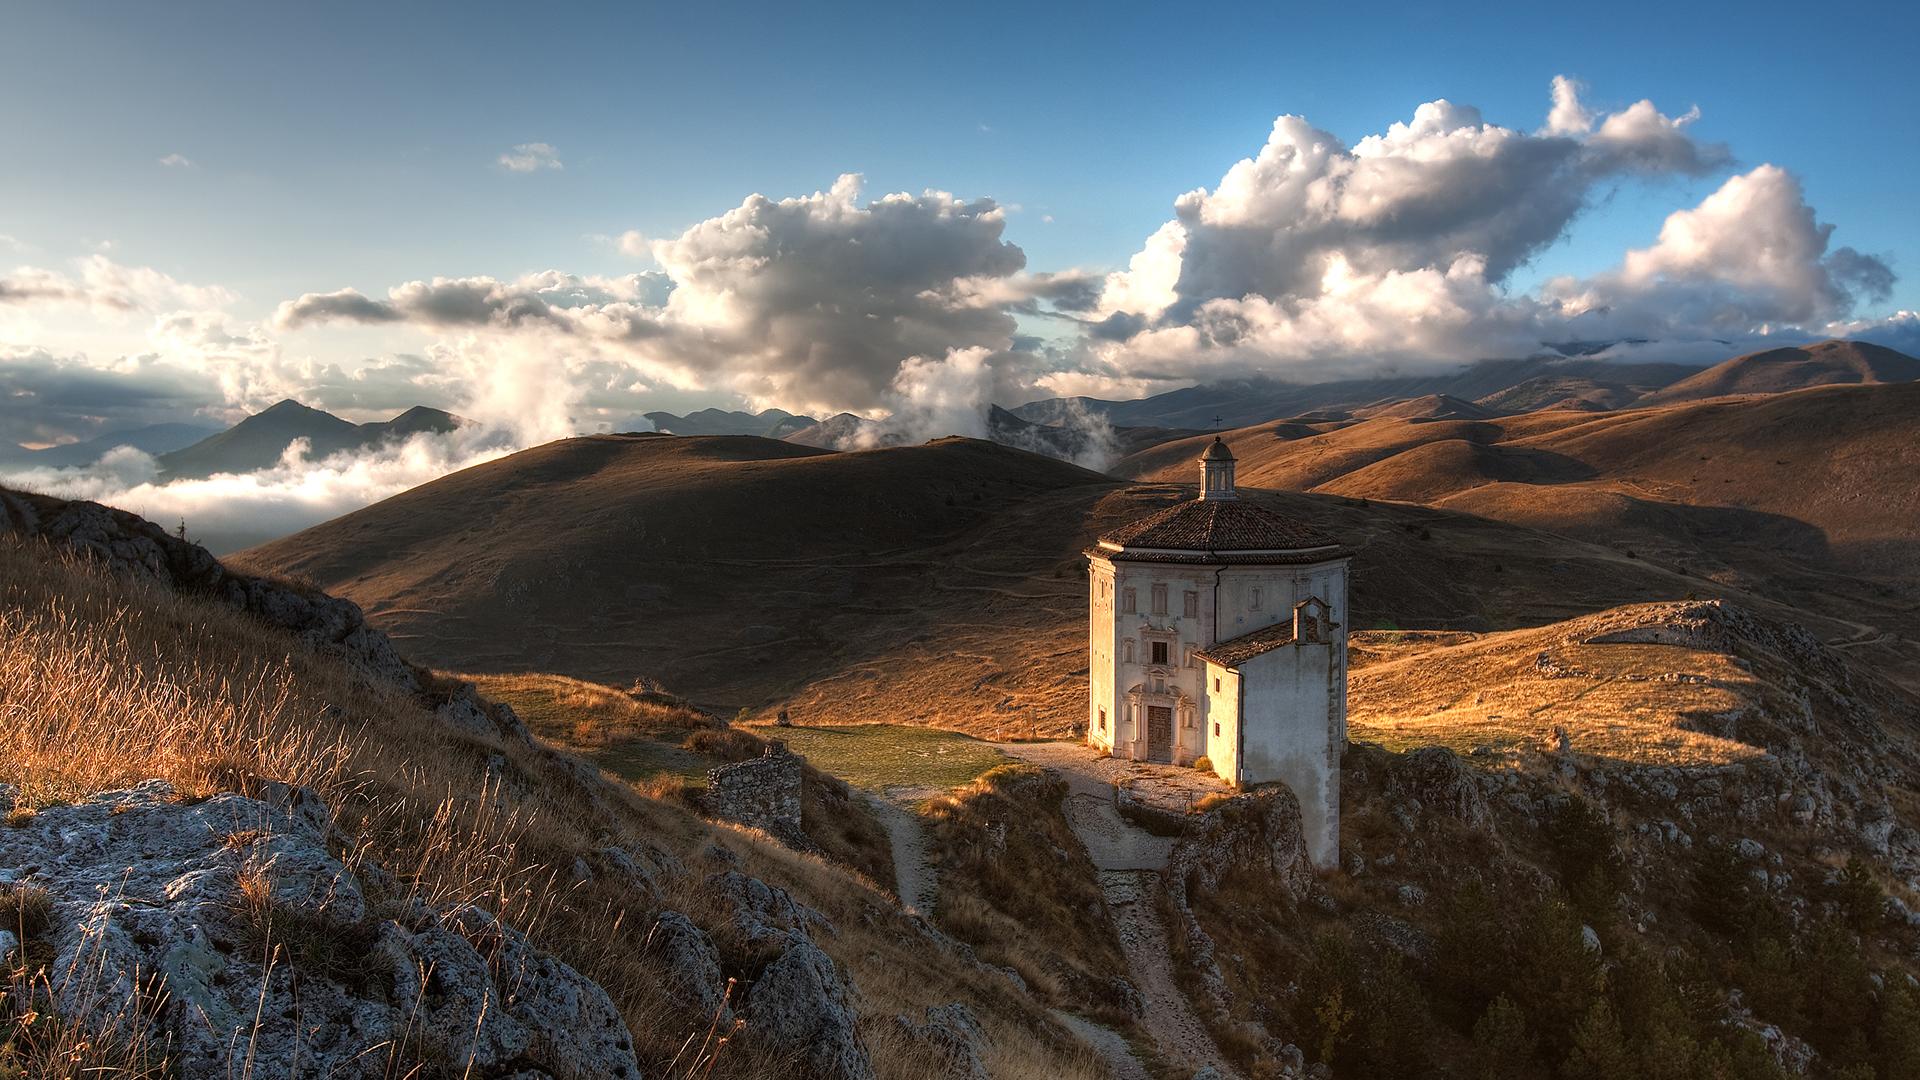 Hd wallpaper landscape - Landscape Full Hd Wallpaper 1080p Mountains Clouds Full Hd